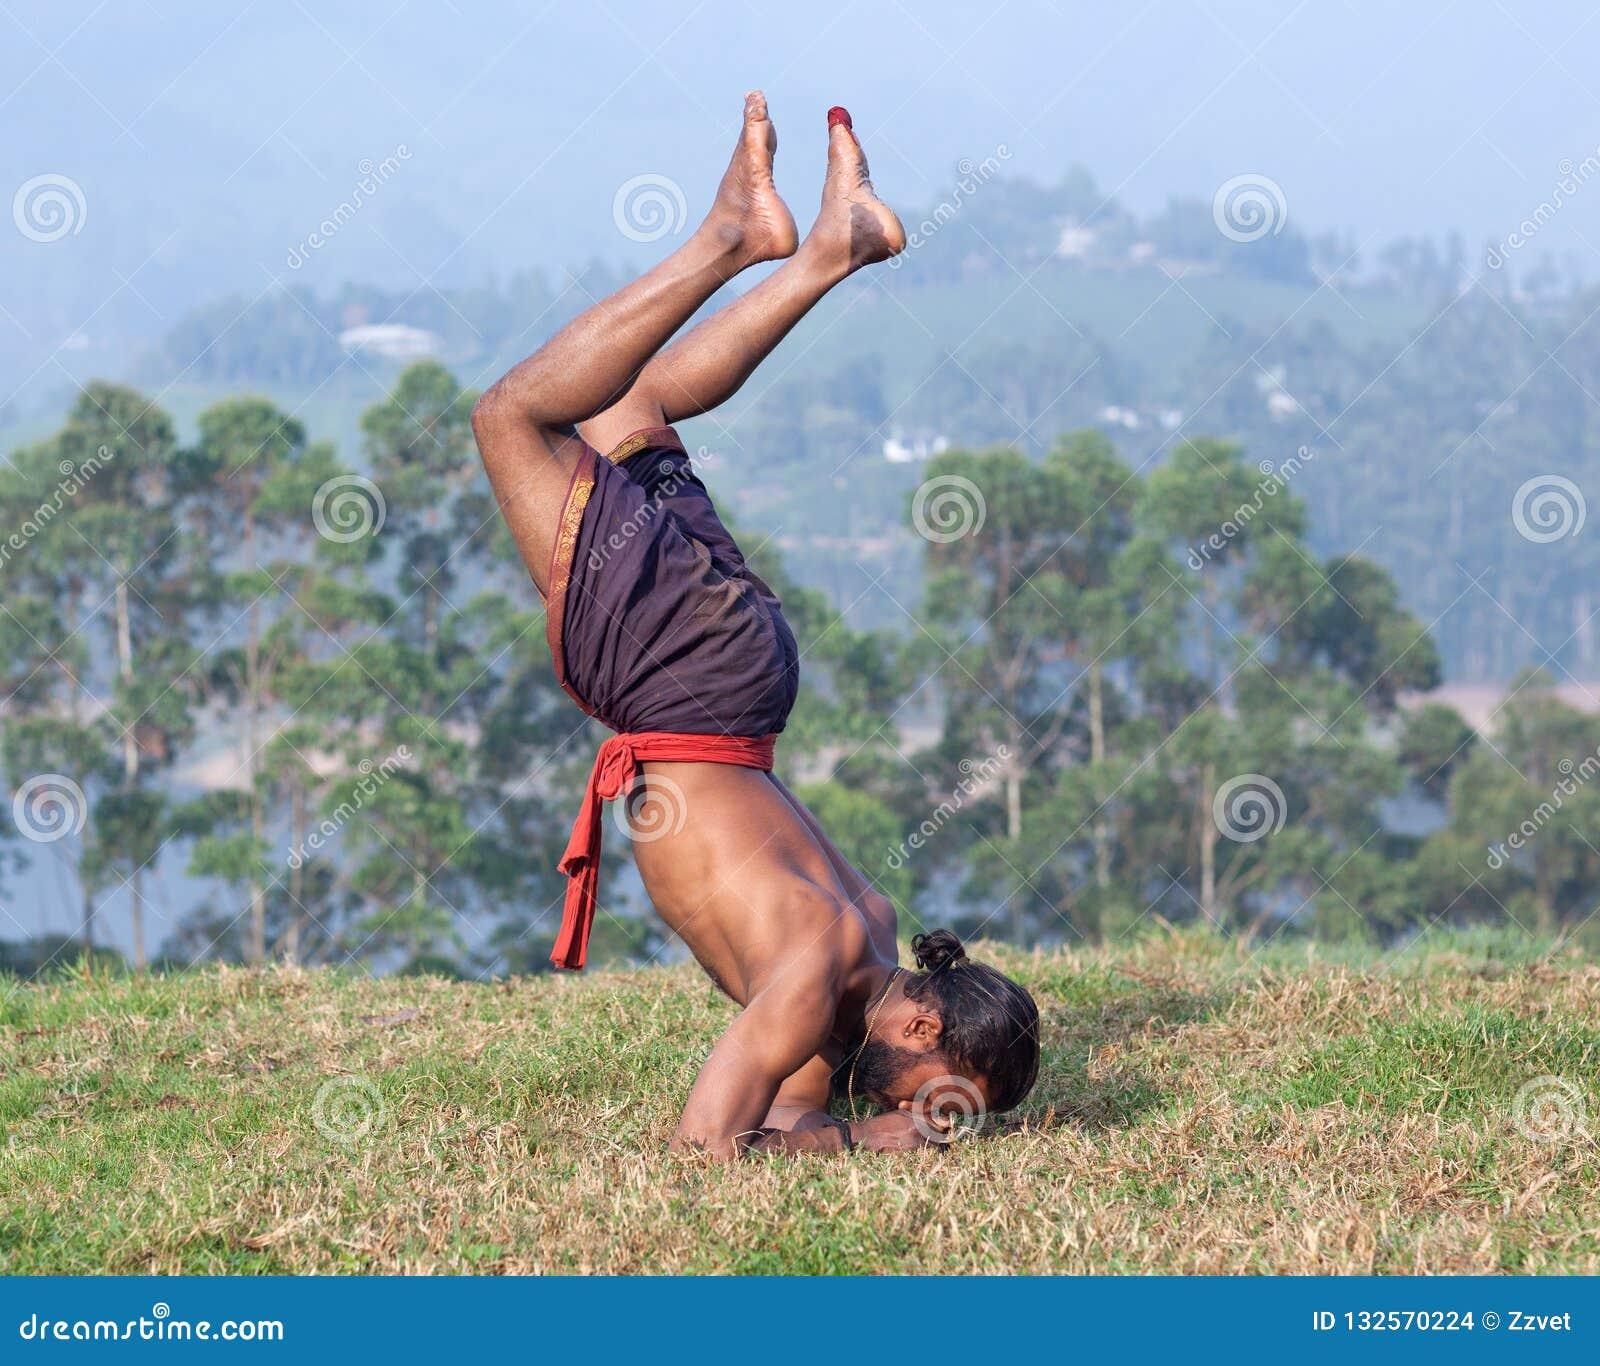 Indian Man Doing Yoga Exercises In Kerala India Stock Photo Image Of Exercises Fitness 132570224